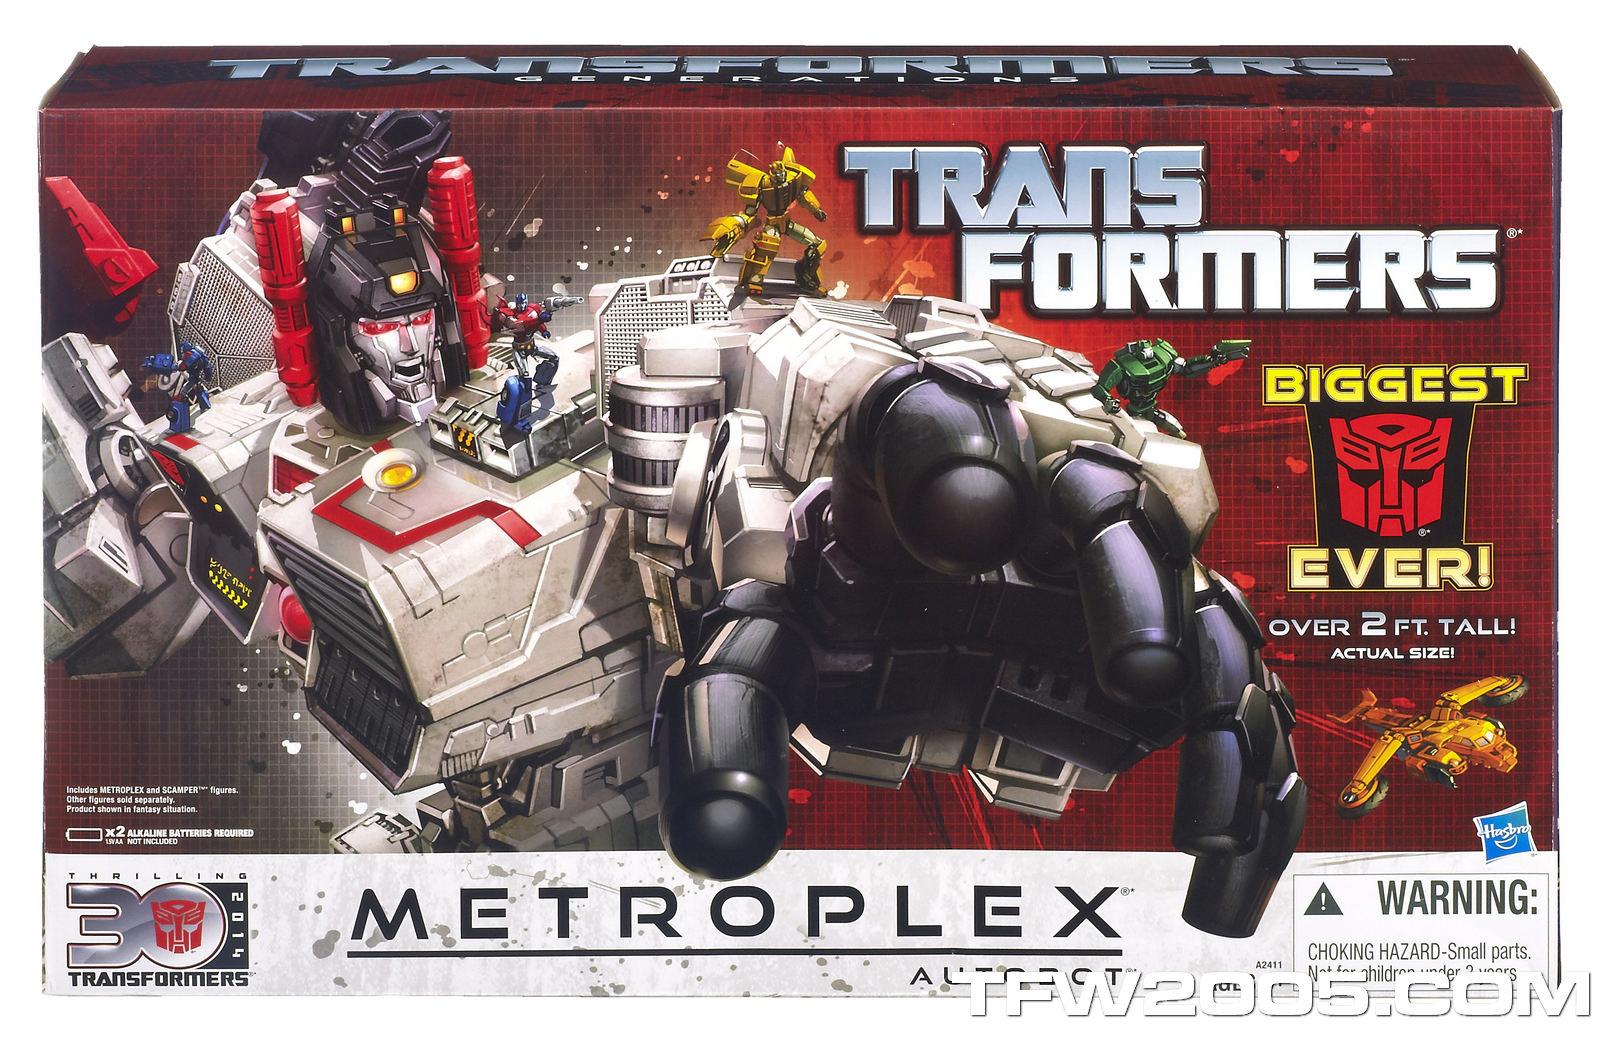 Current Generation Transformers Generations-Metroplex-01_1370963106